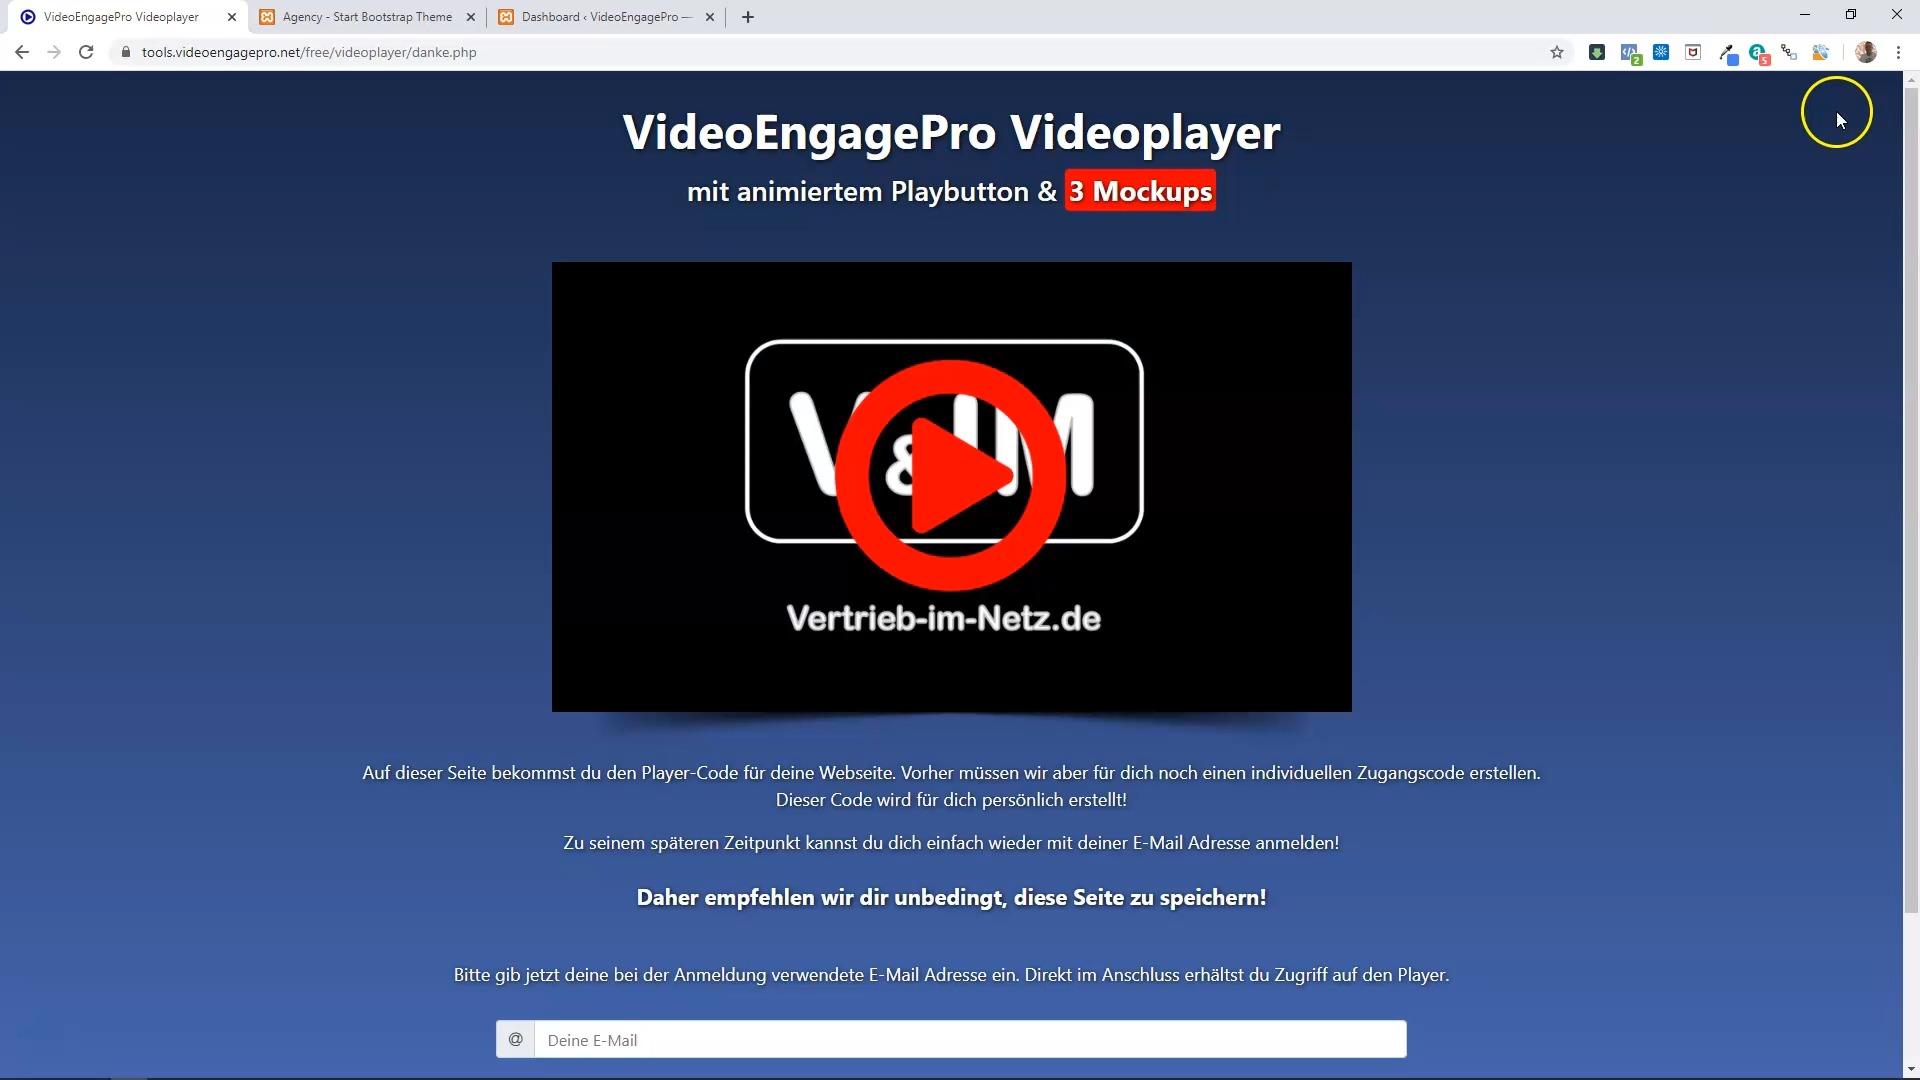 VideoEngage - kostenloser Profi-Videoplayer